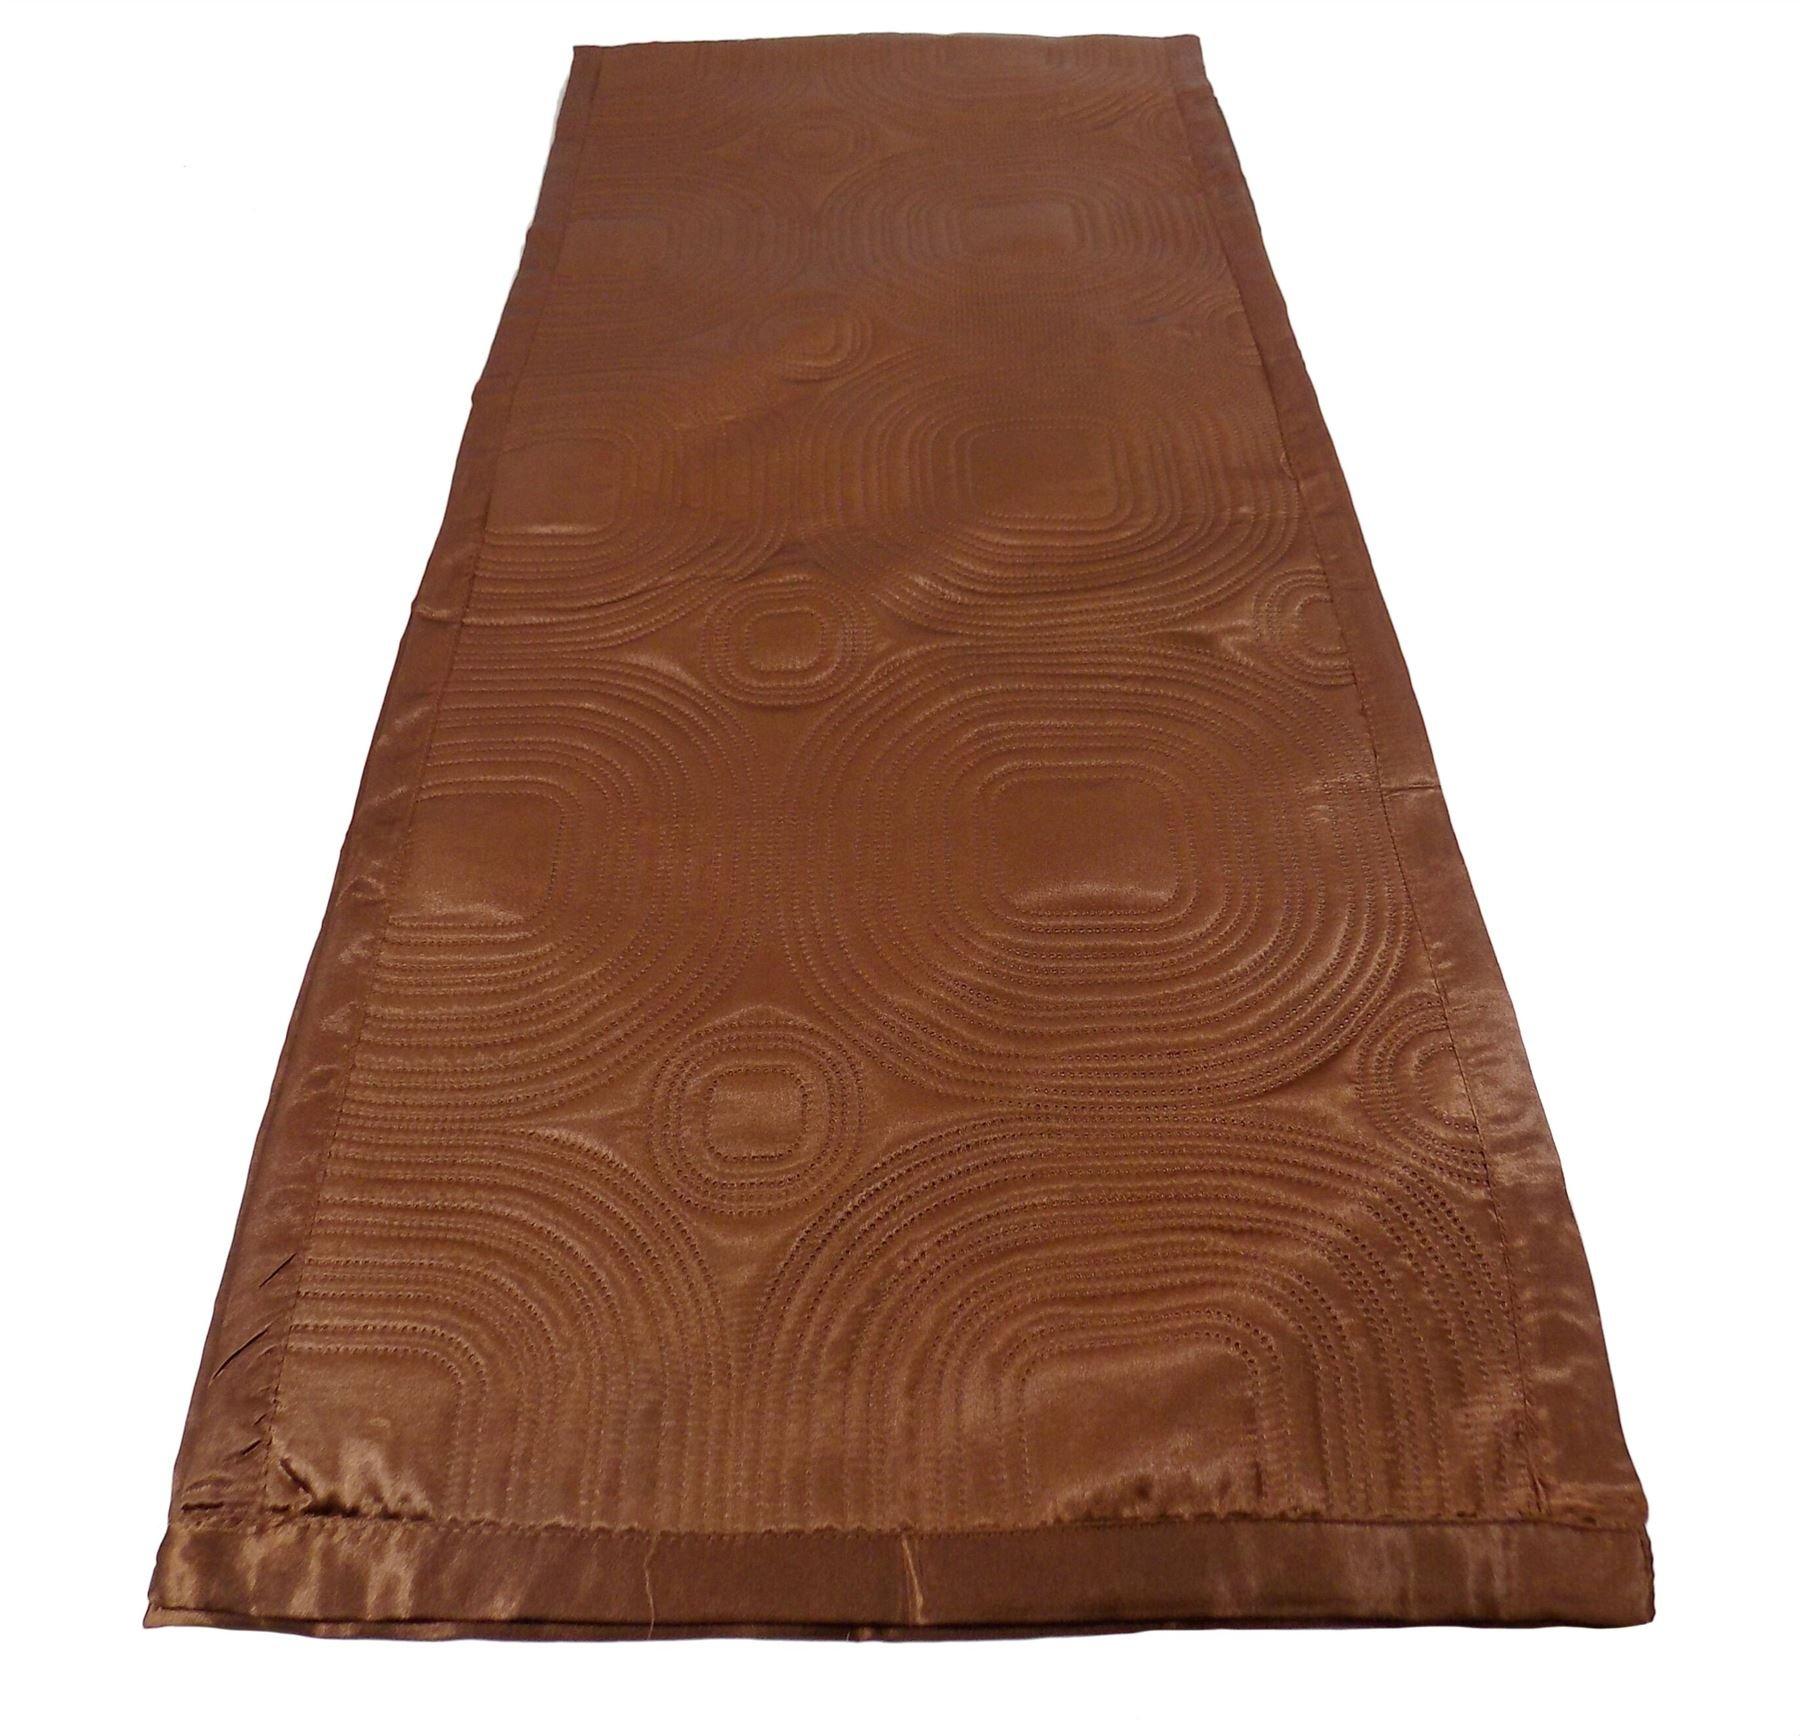 LUXURIOUS CHOCOLATE BROWN SATIN EMBOSSED LONG BEDROOM BED RUNNER 45 X 220CM - 18'' X 86''